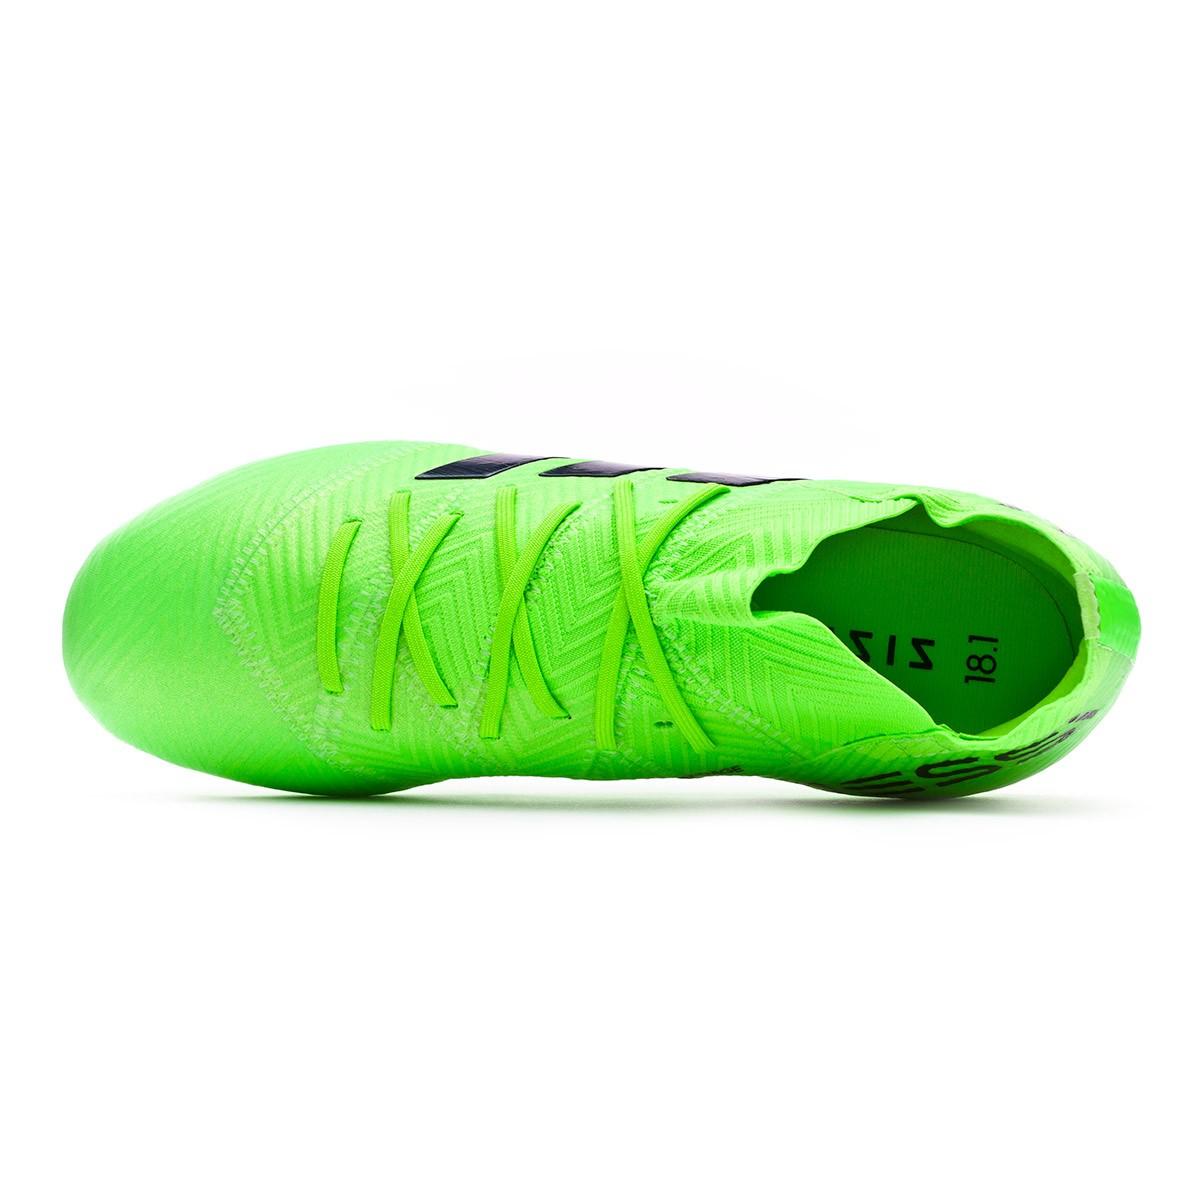 1ba376d025b Football Boots adidas Kids Nemeziz Messi 18.1 FG Solar green-Black -  Football store Fútbol Emotion